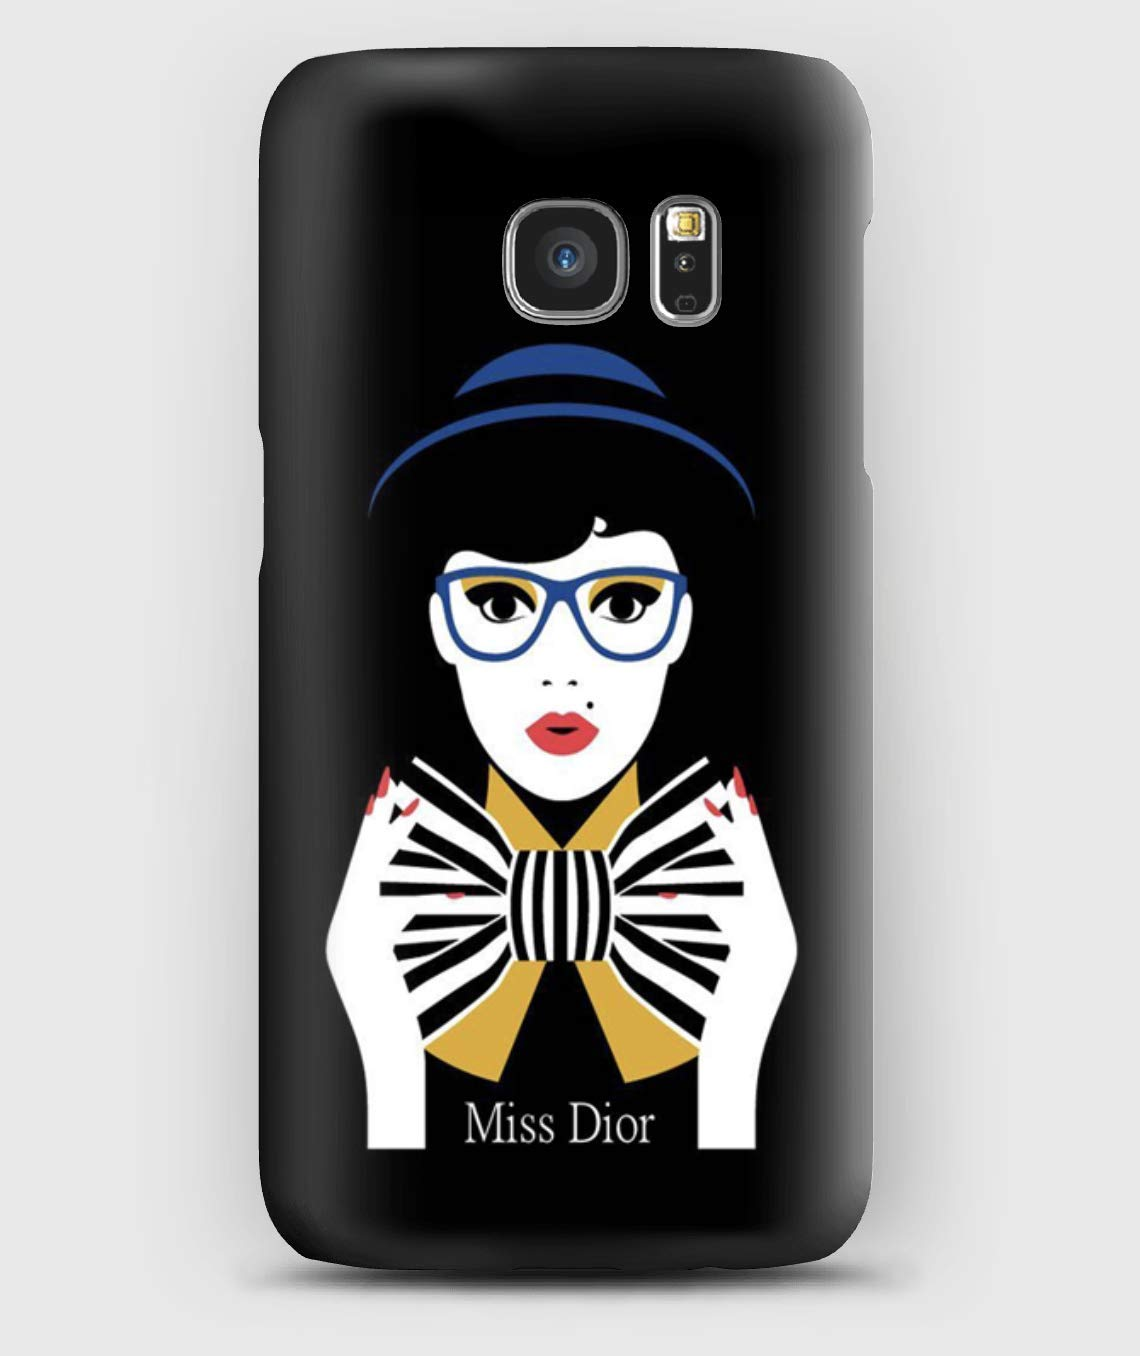 Coque Samsung S5, S6, S7, S8,S9, A3, A5, A7,A8, J3,J5, Note 4,5,8,9, Grand prime, Miss Dior … Miss Dior ...